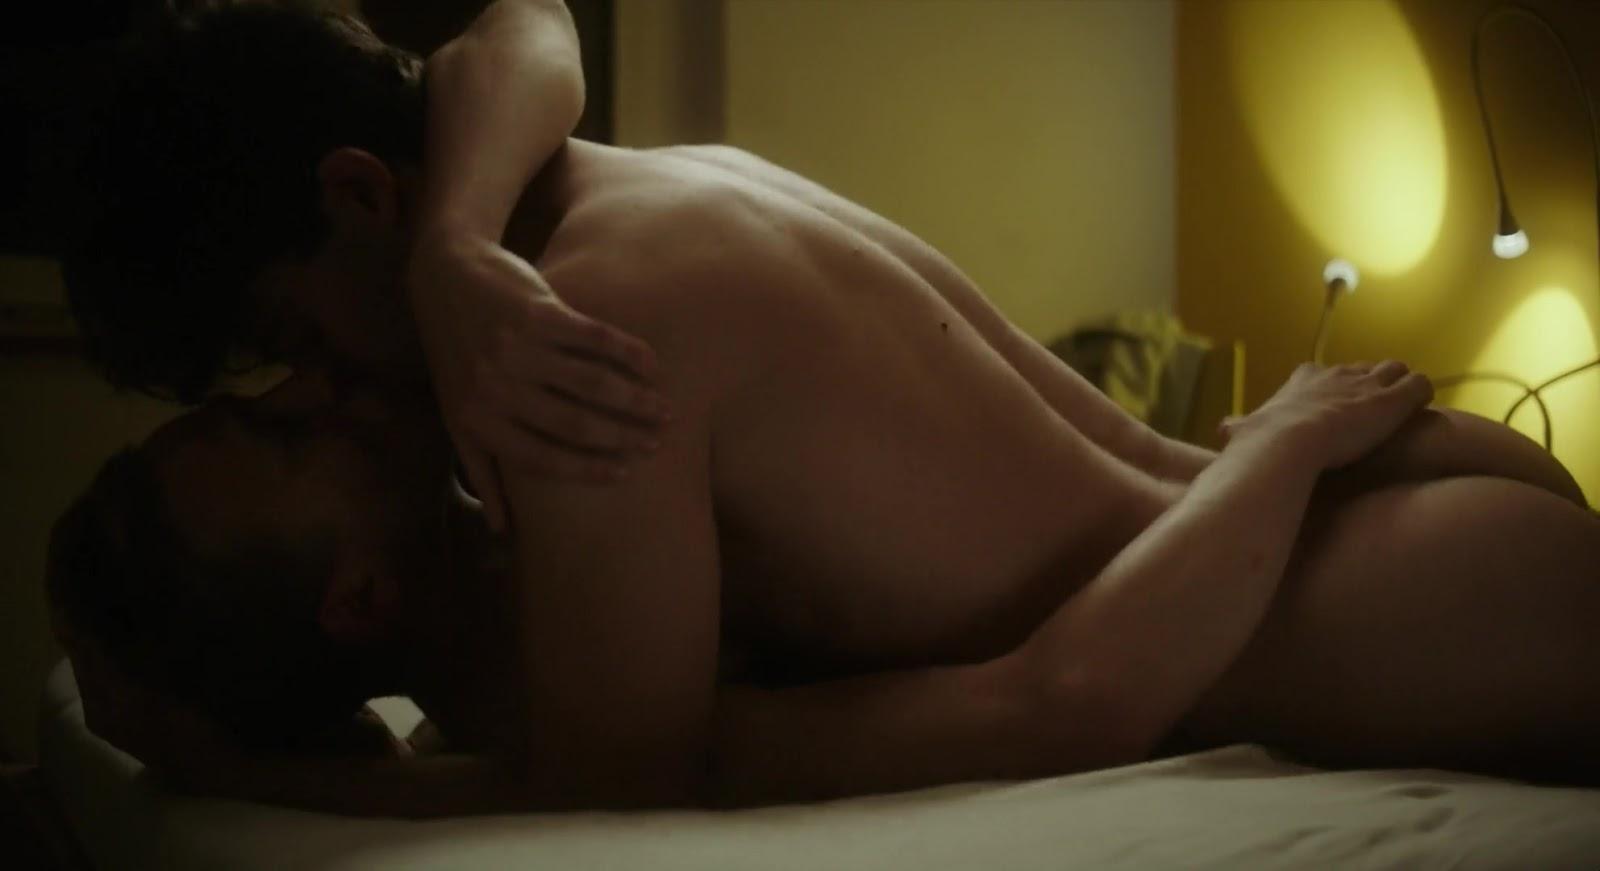 Aaron Porno shirtless men on the blog: aaron altaras & max hubacher